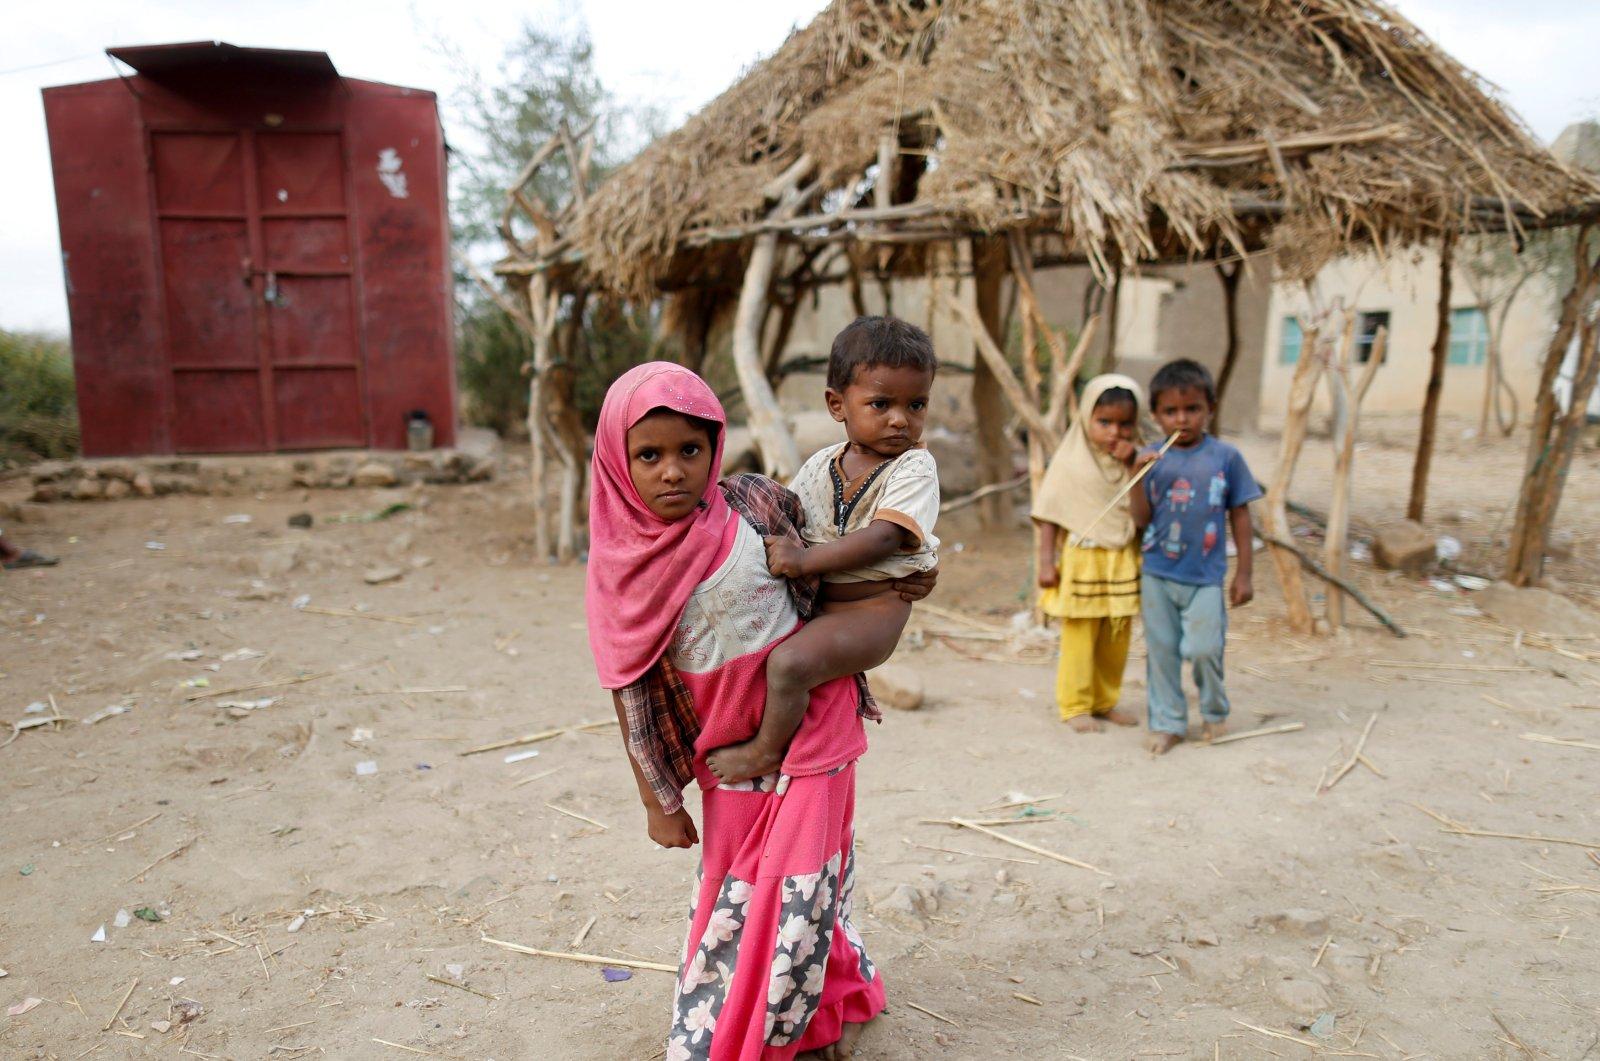 Children are seen in the village in al-Jaraib, Yemen, Feb. 18, 2019. (Reuters Photo)